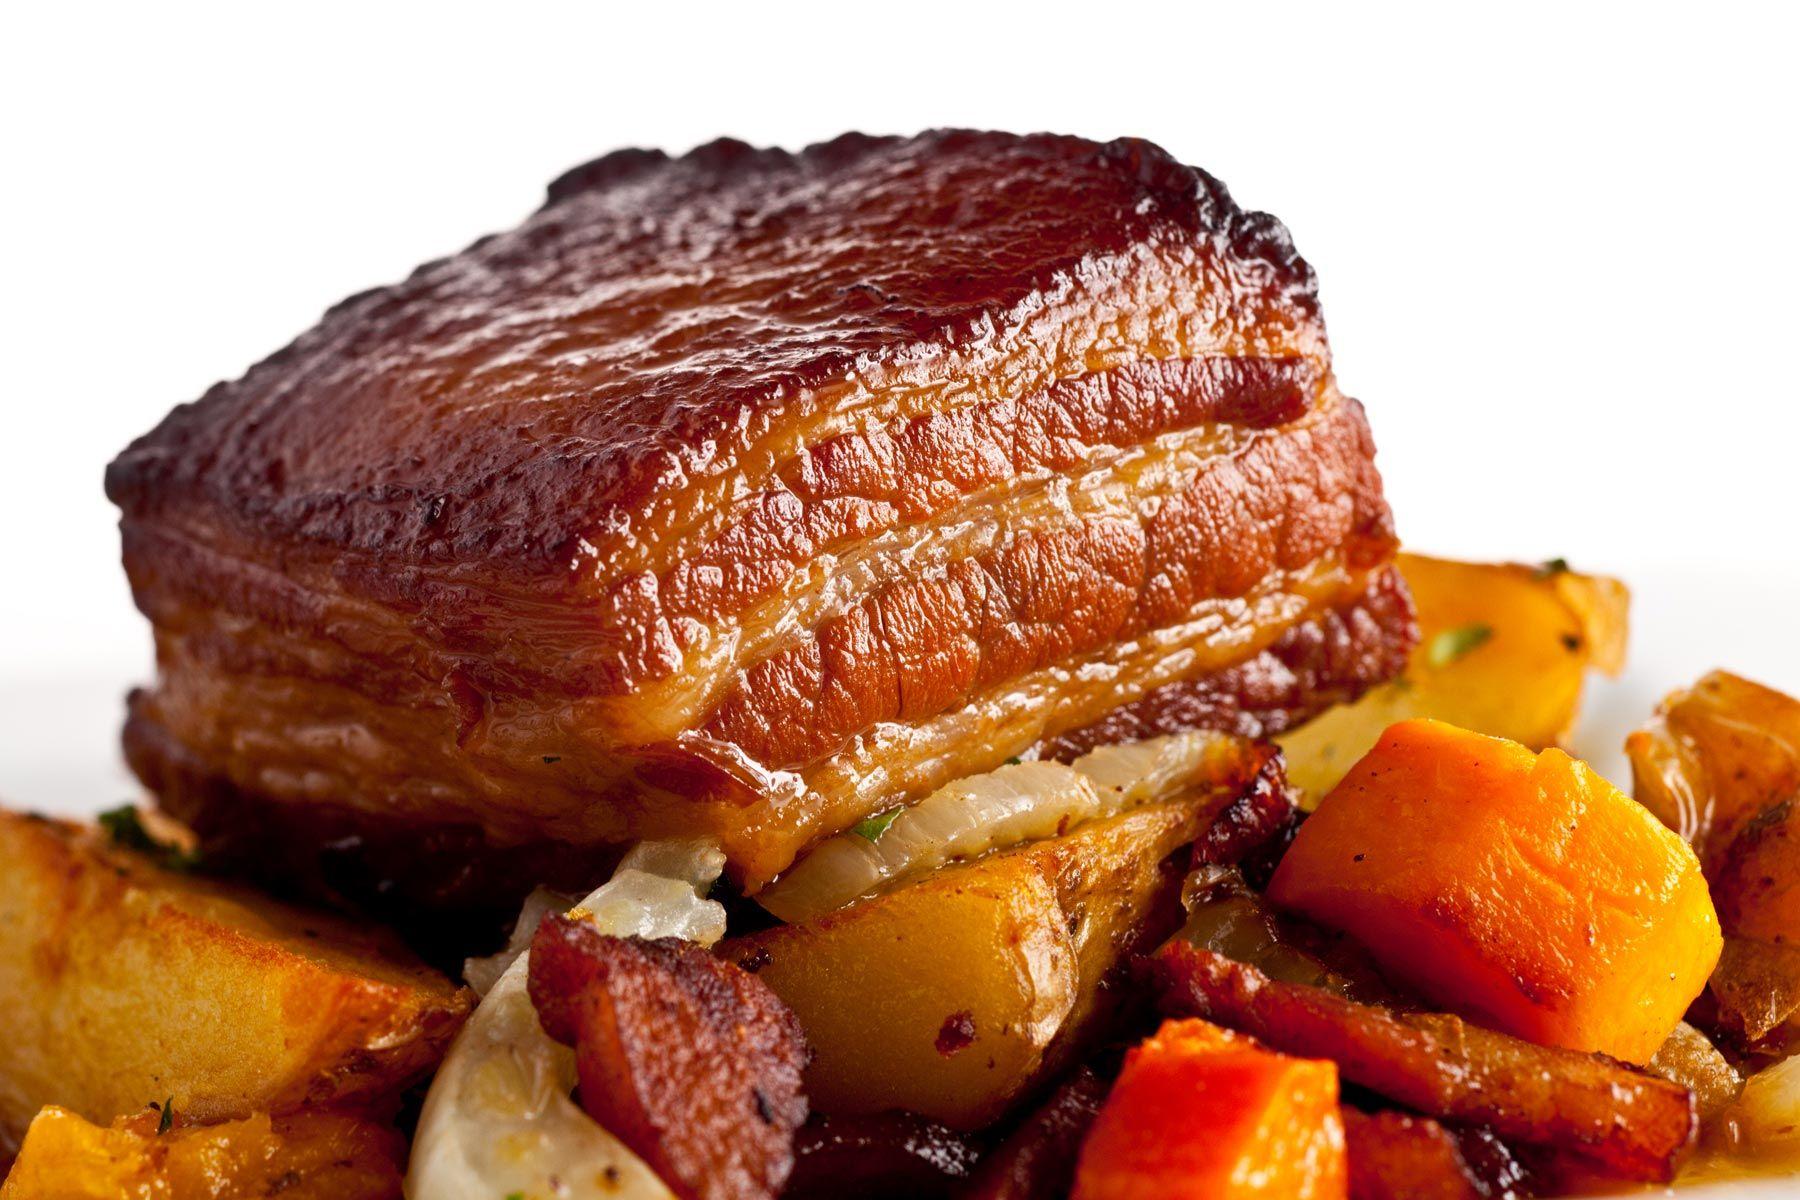 Porkbelly-on-root-vegetables-Spring-Lake-Country-Club.jpg